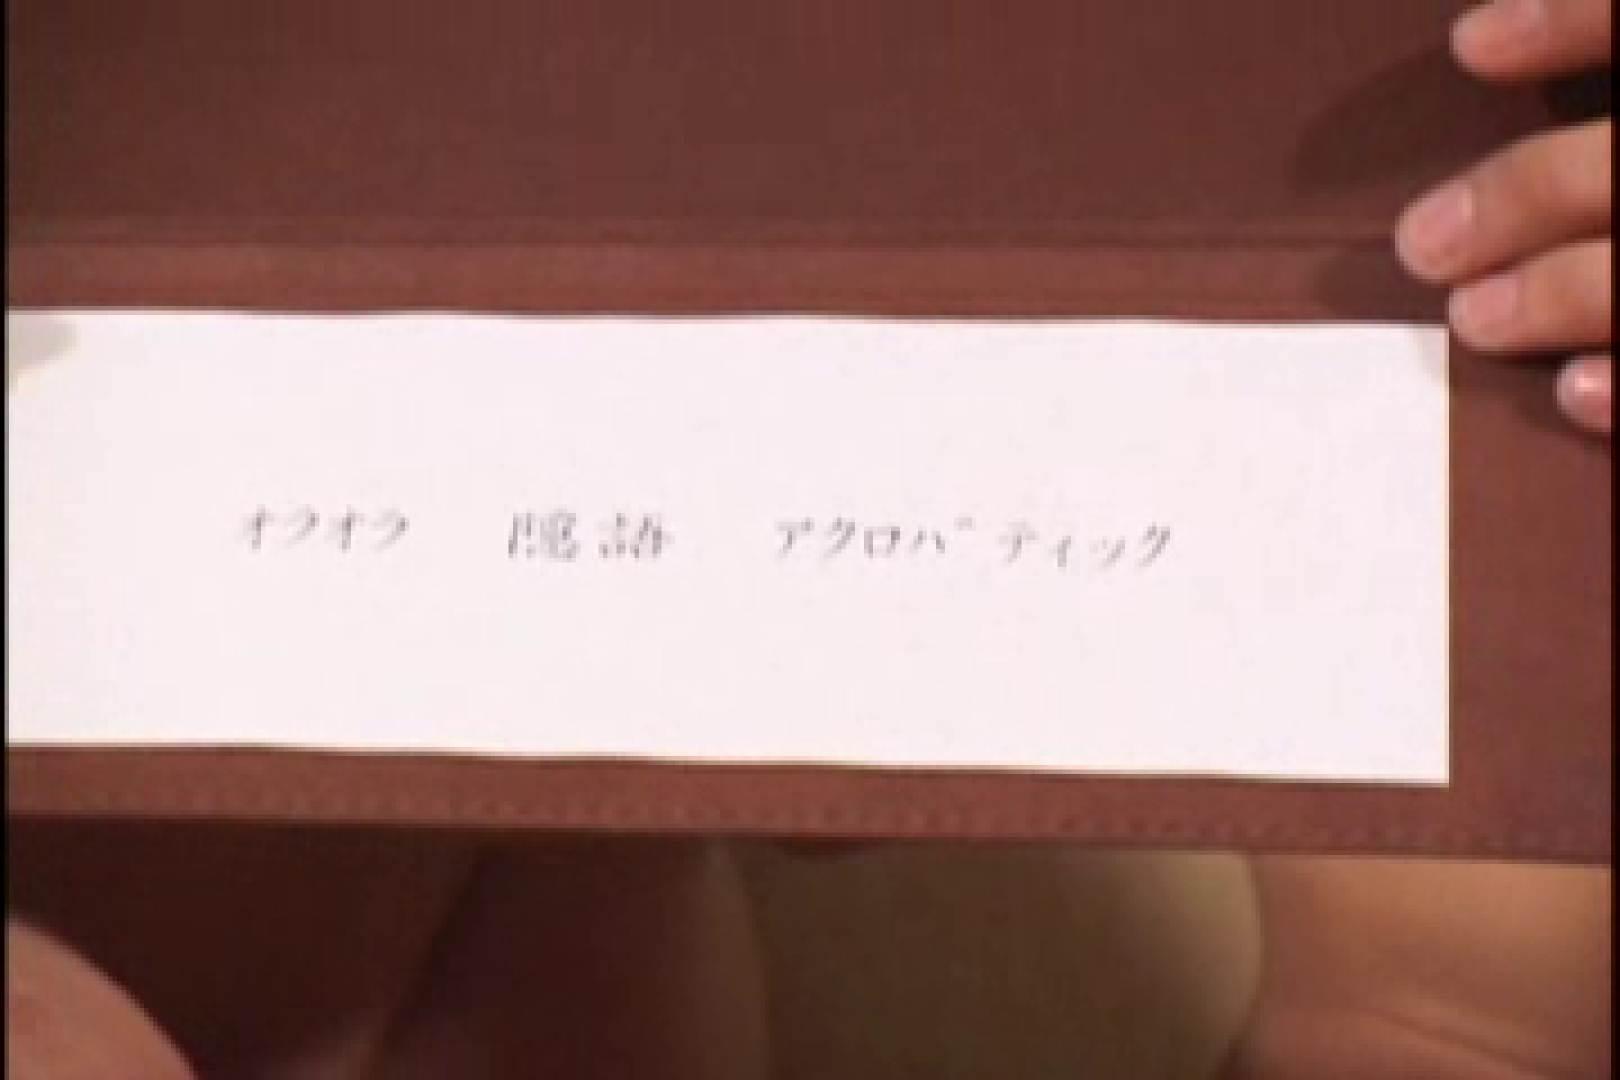 BEST OF イケメン!!男目線のガチSEX vol.04(対女性作品) 対女性  55画像 36